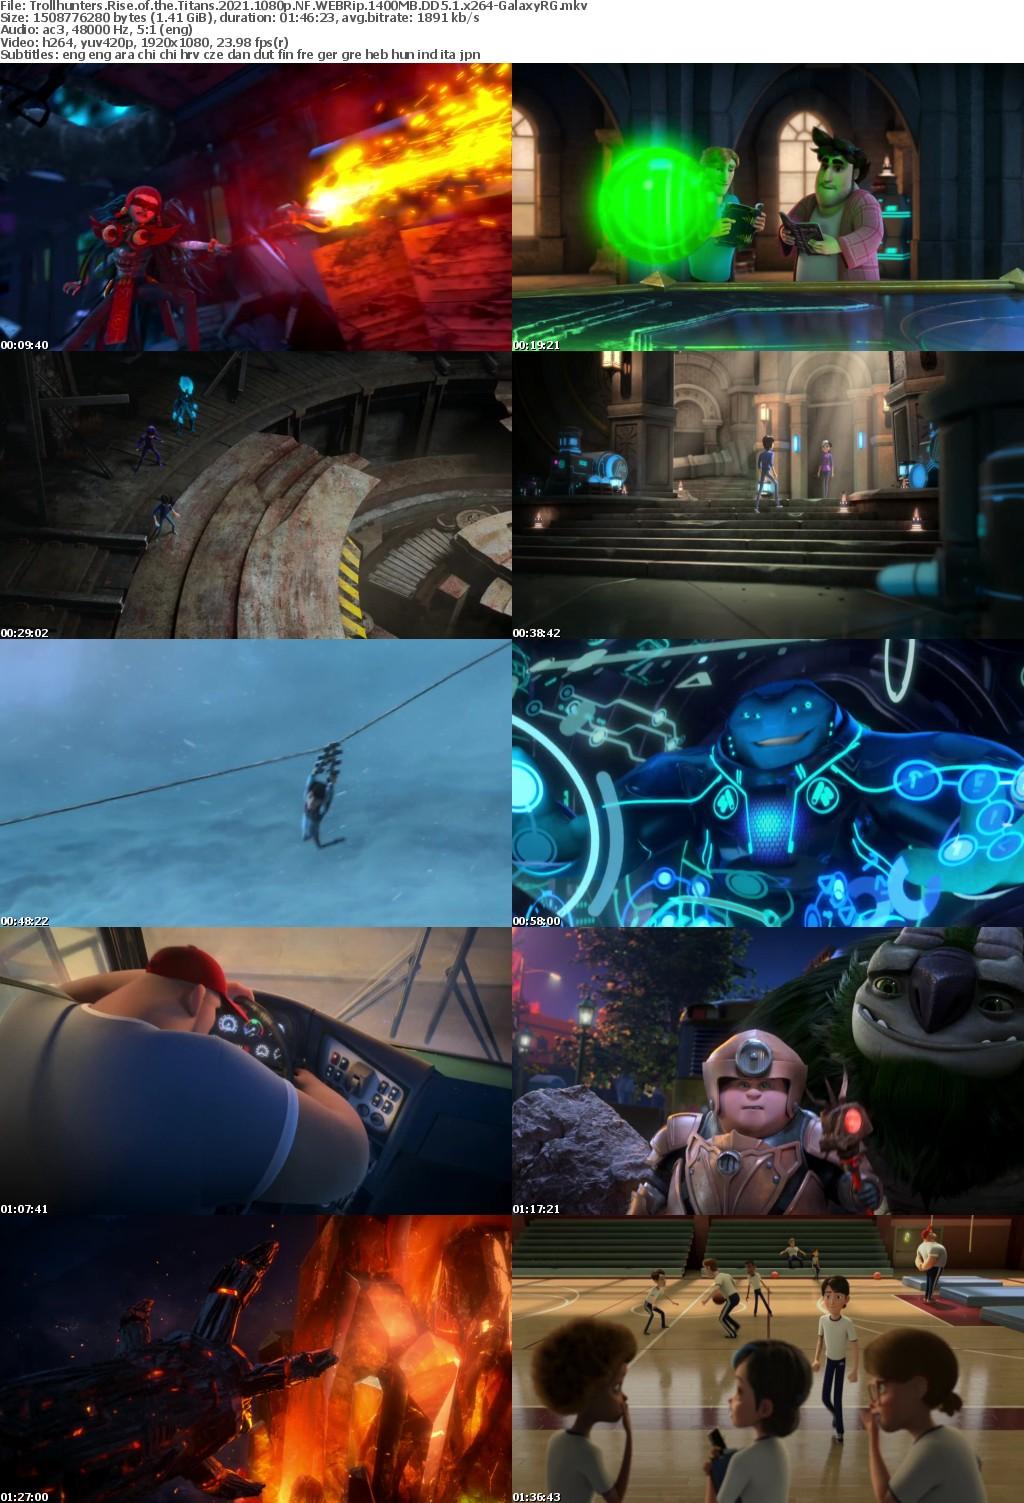 Trollhunters Rise of the Titans 2021 1080p NF WEBRip 1400MB DD5 1 x264-GalaxyRG